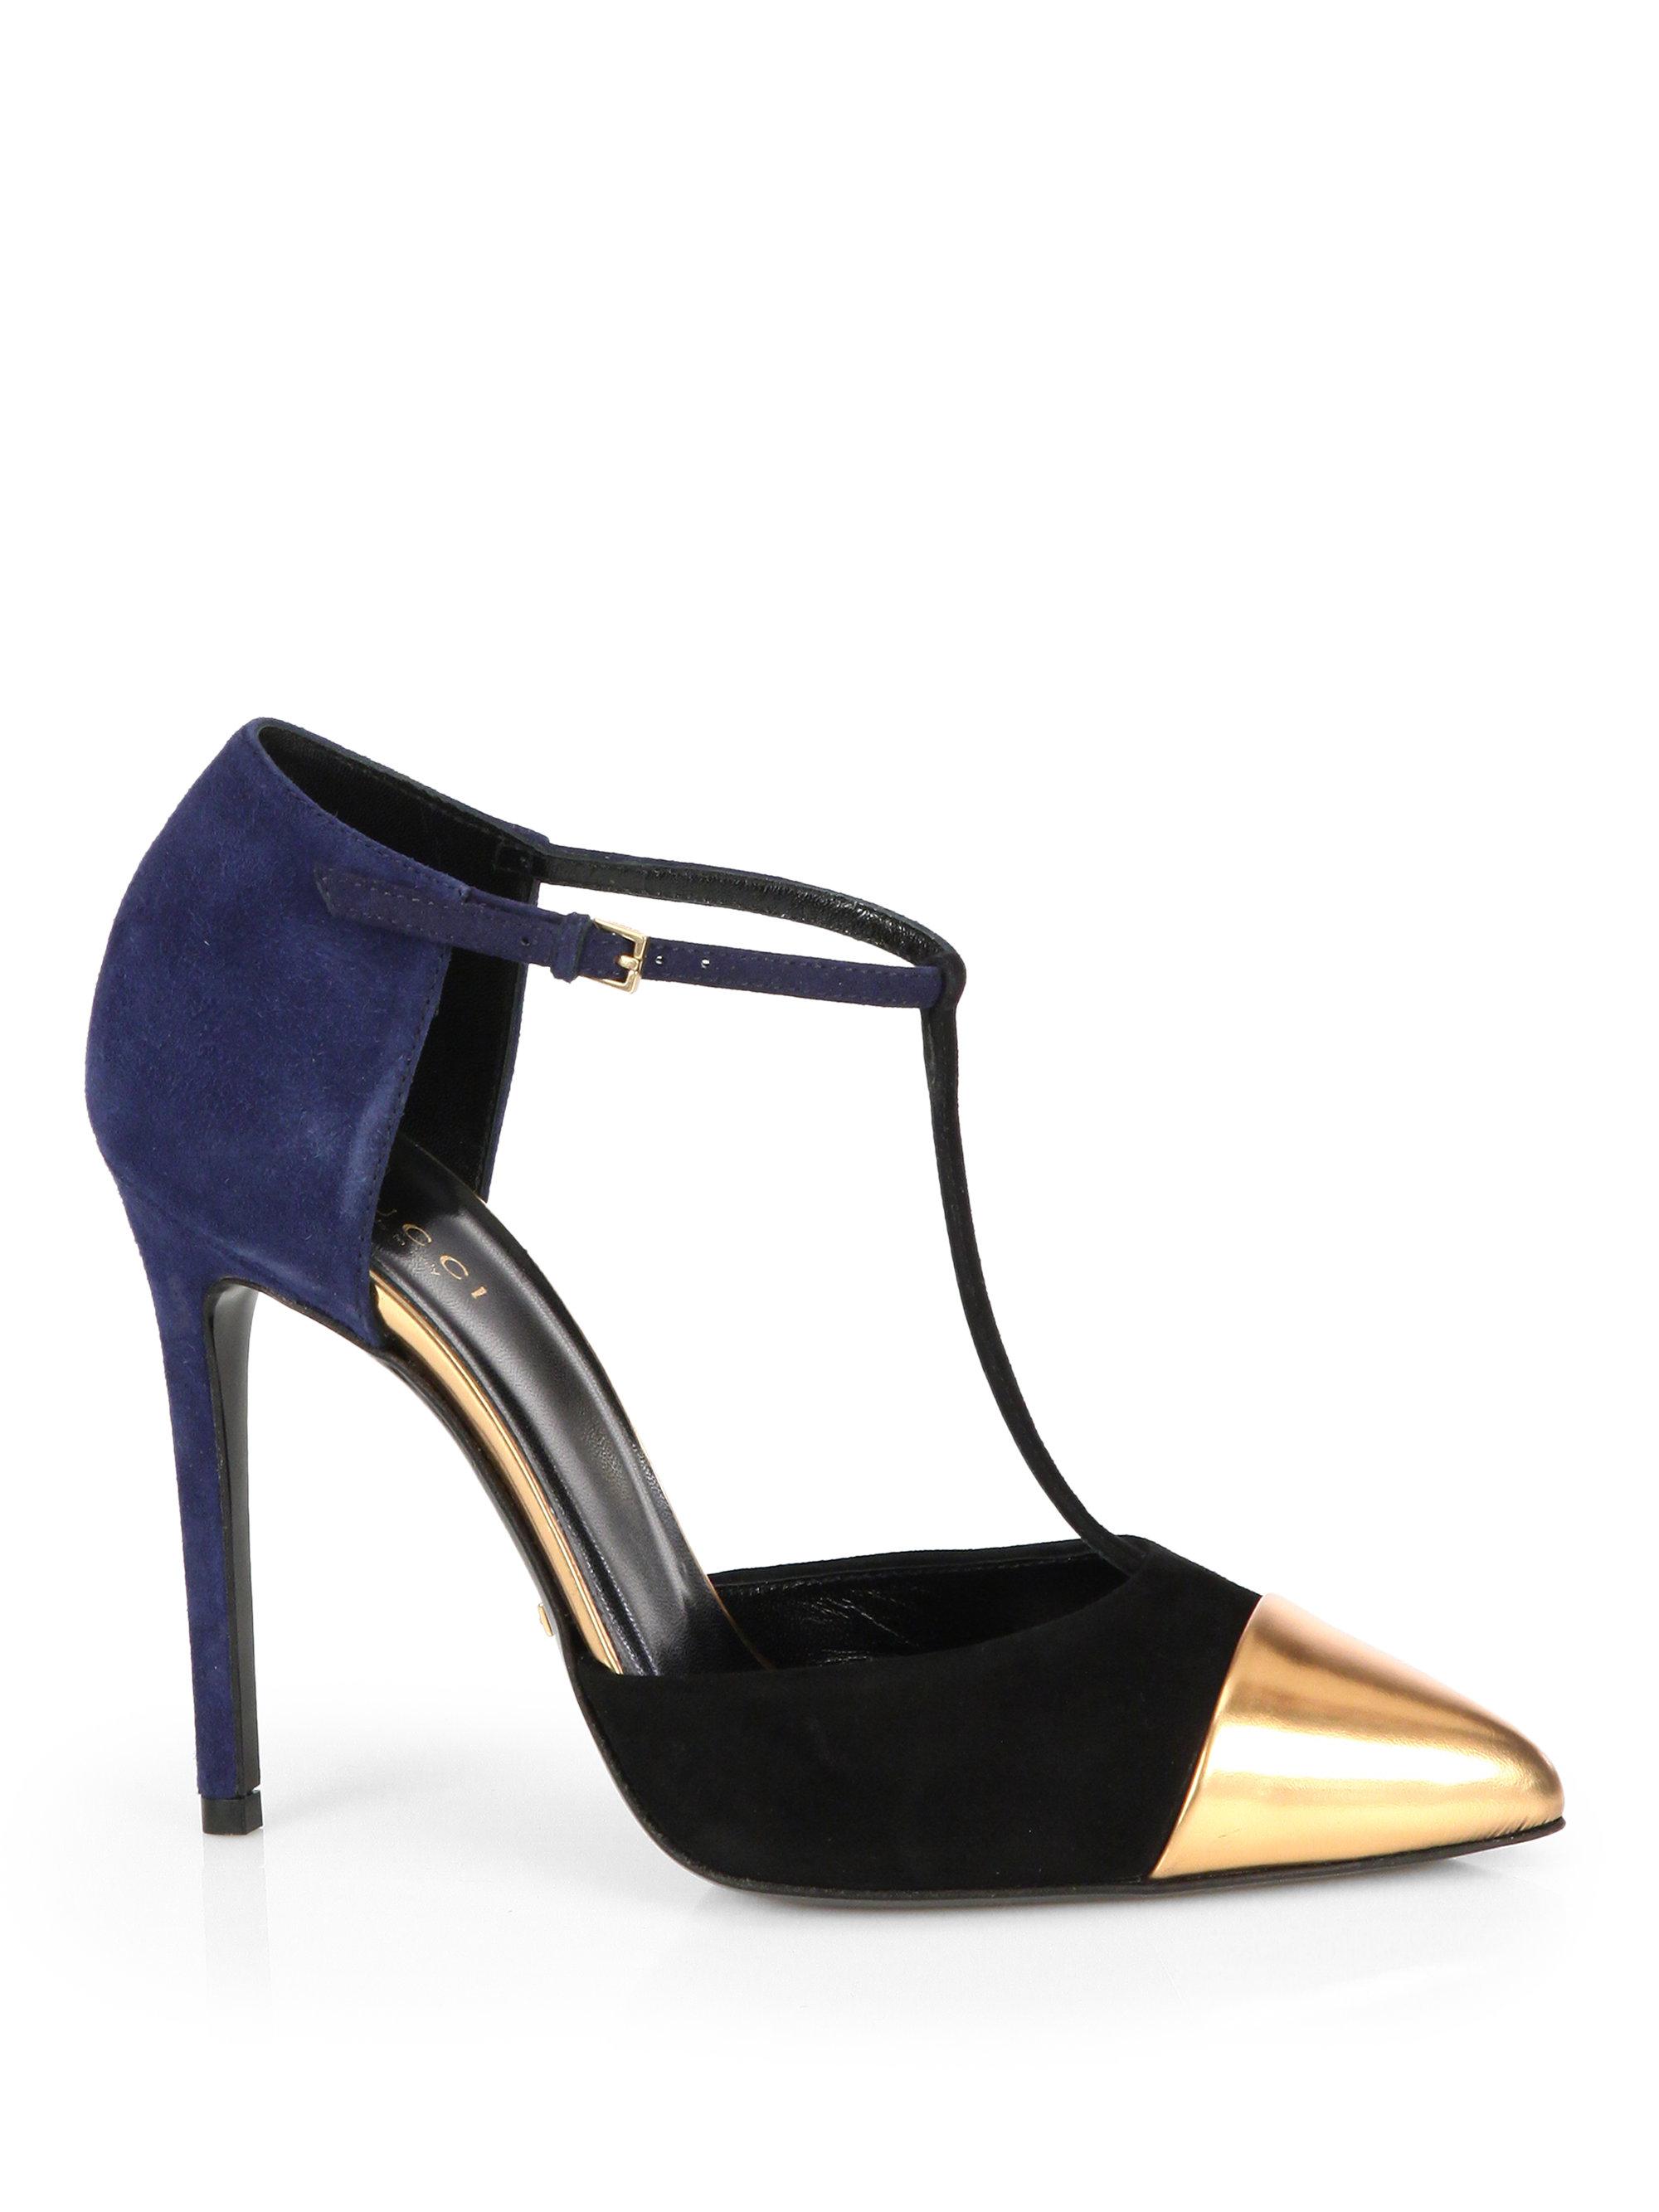 gucci coline suede leather t strap pumps in blue lyst. Black Bedroom Furniture Sets. Home Design Ideas